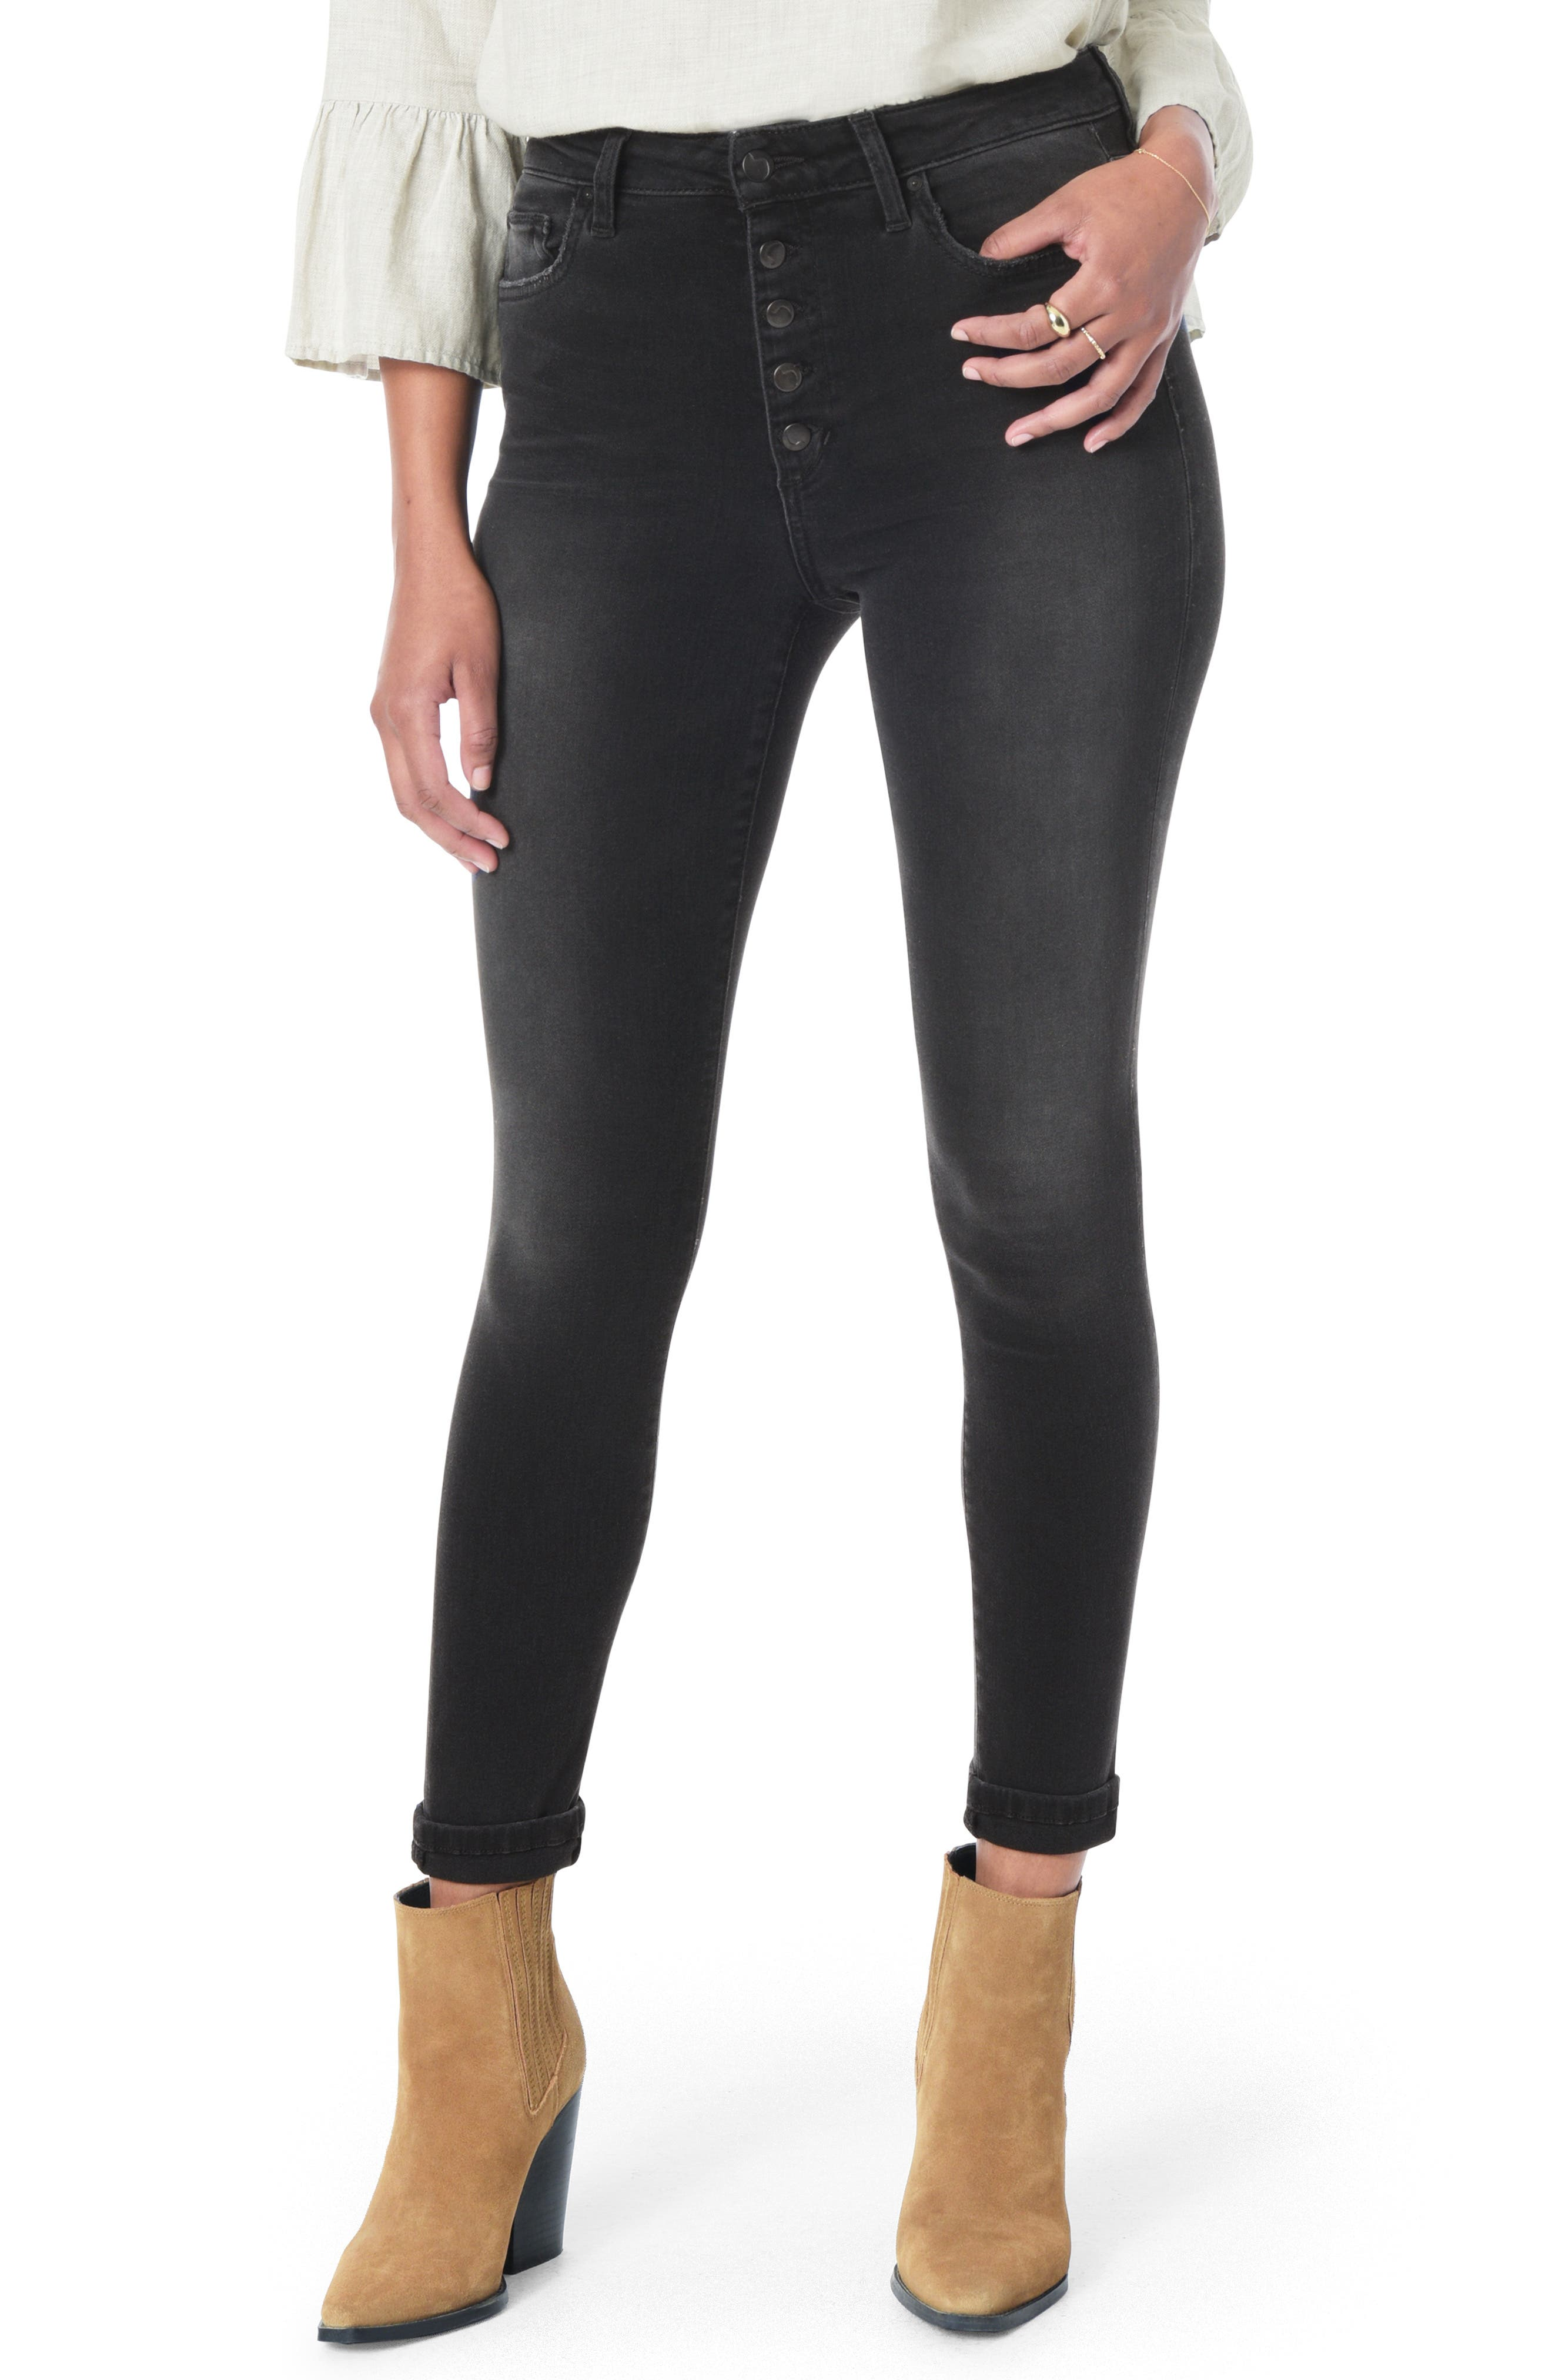 JOE'S,                             Flawless - Honey Curvy High Waist Ankle Skinny Jeans,                             Main thumbnail 1, color,                             GABBIE